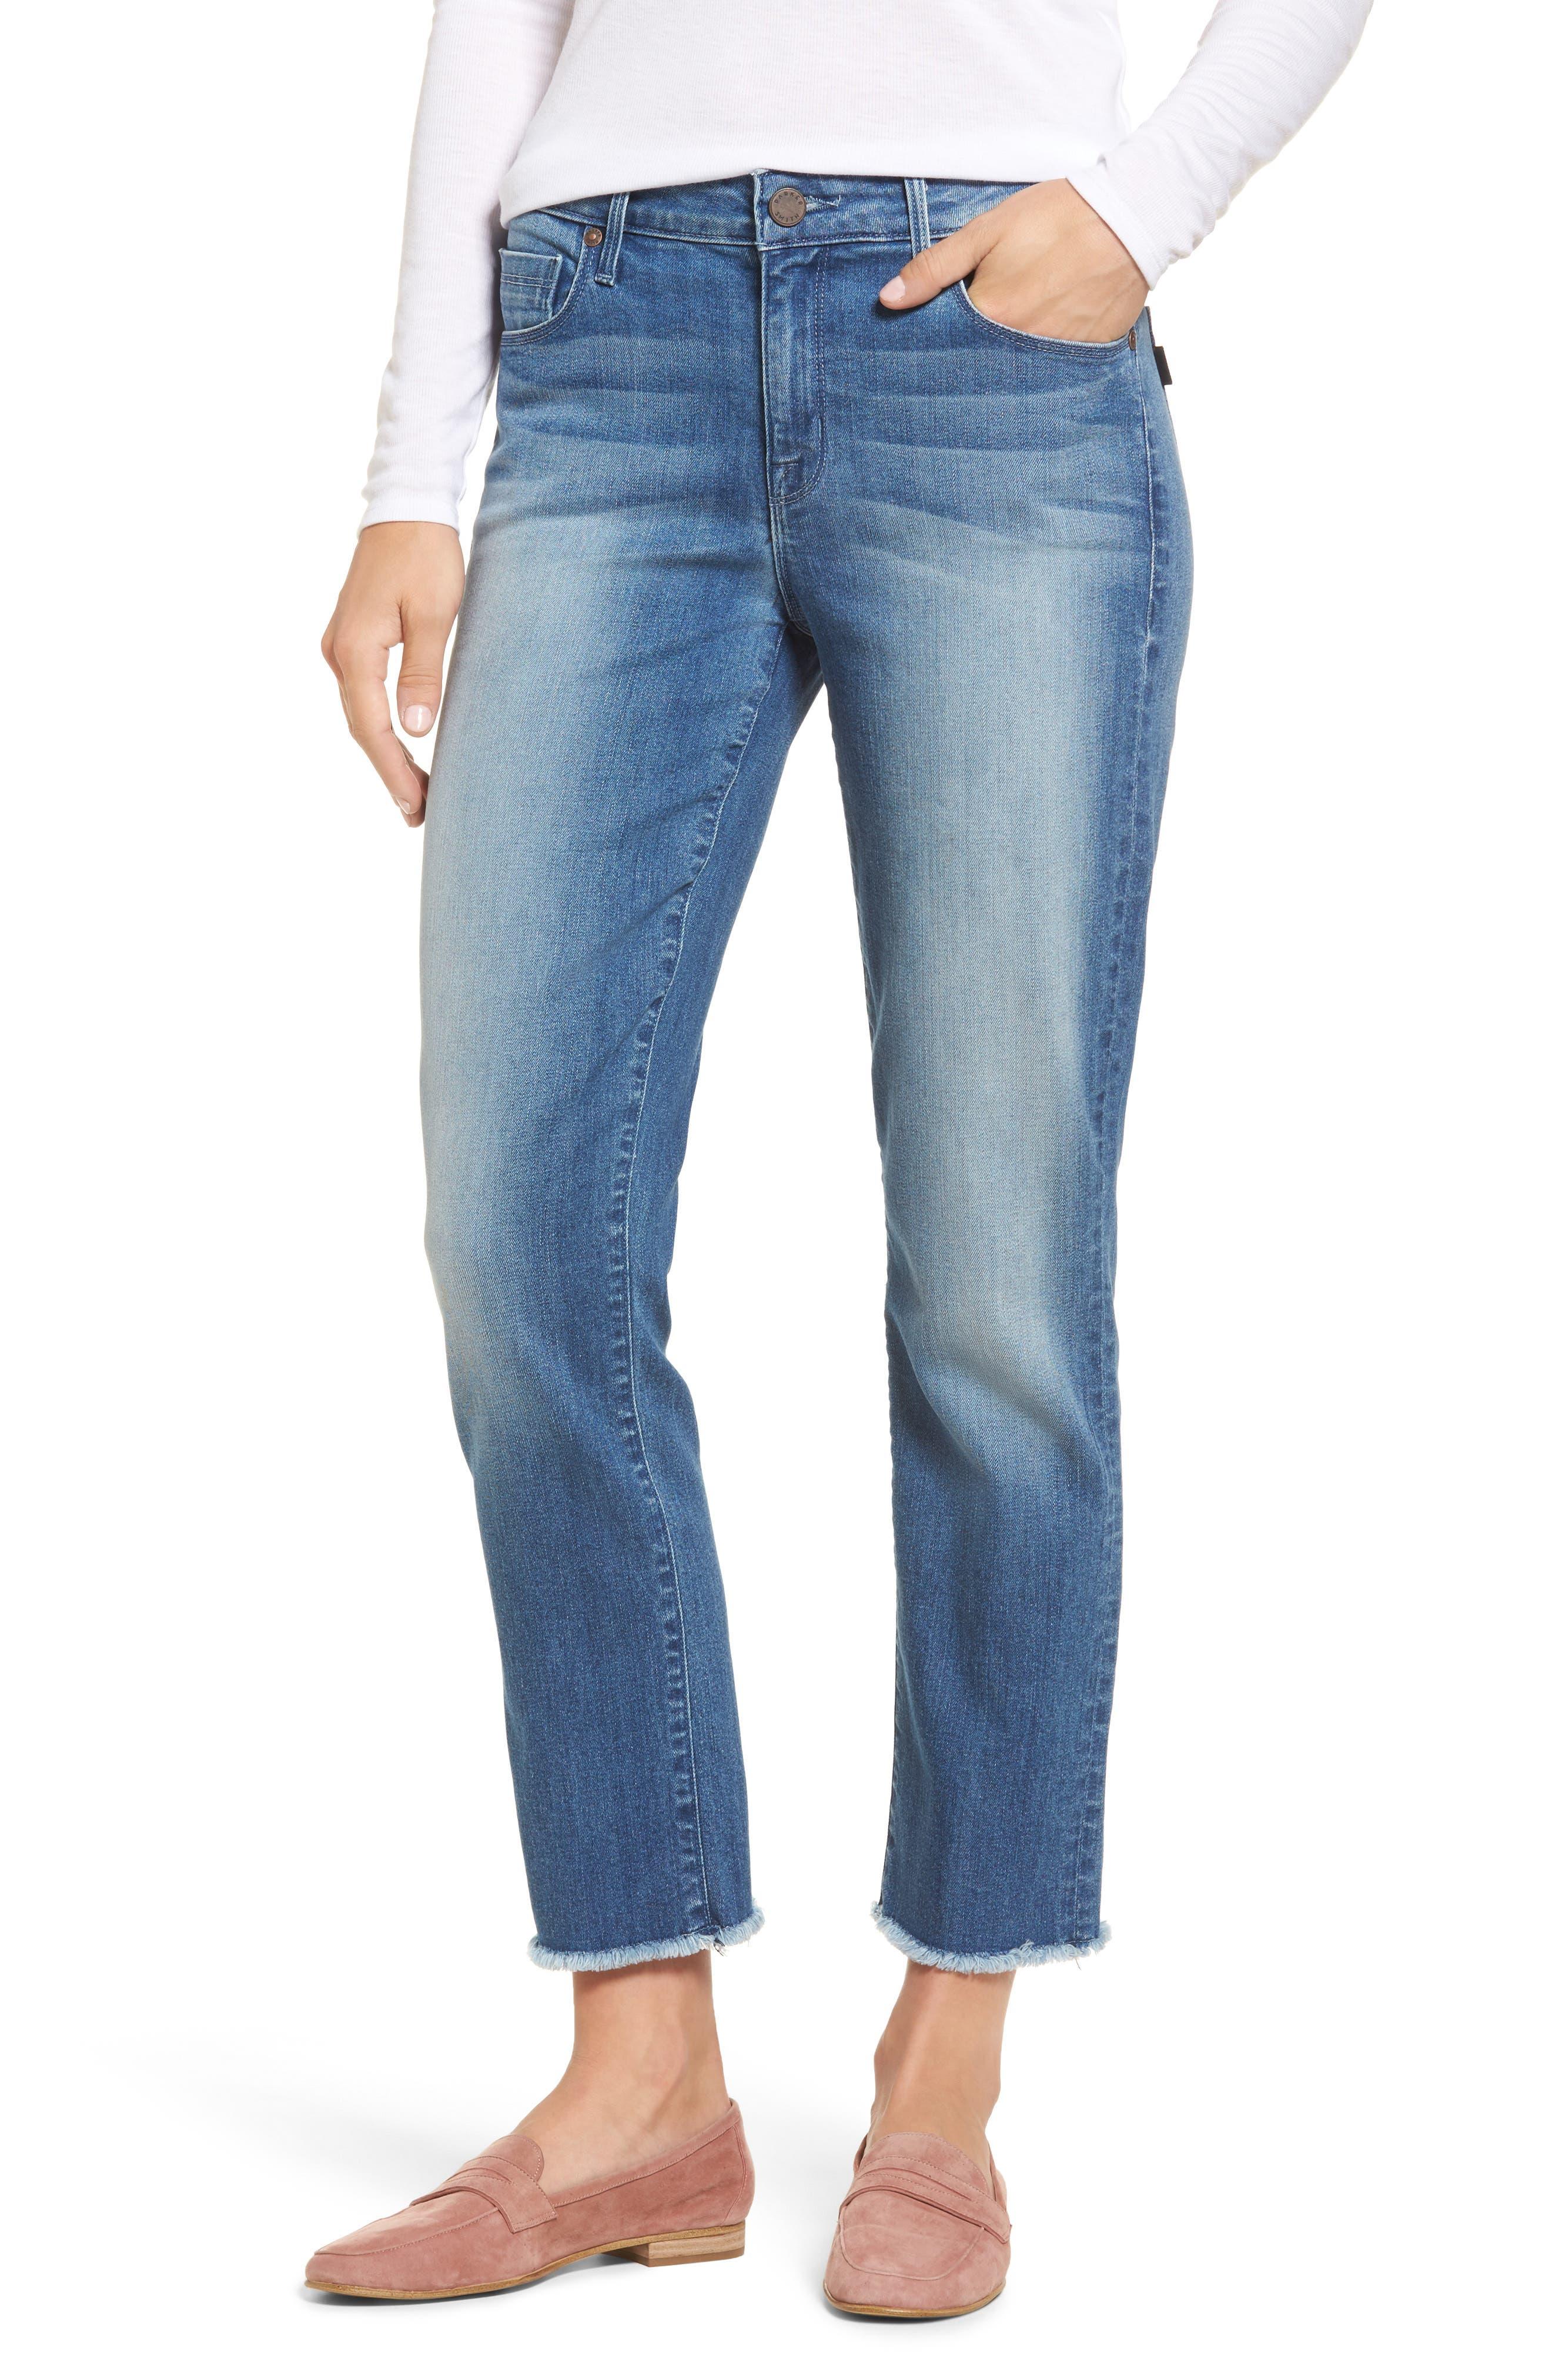 Main Image - PARKER SMITH Raw Edge Ankle Straight Jeans (Sea Coast)